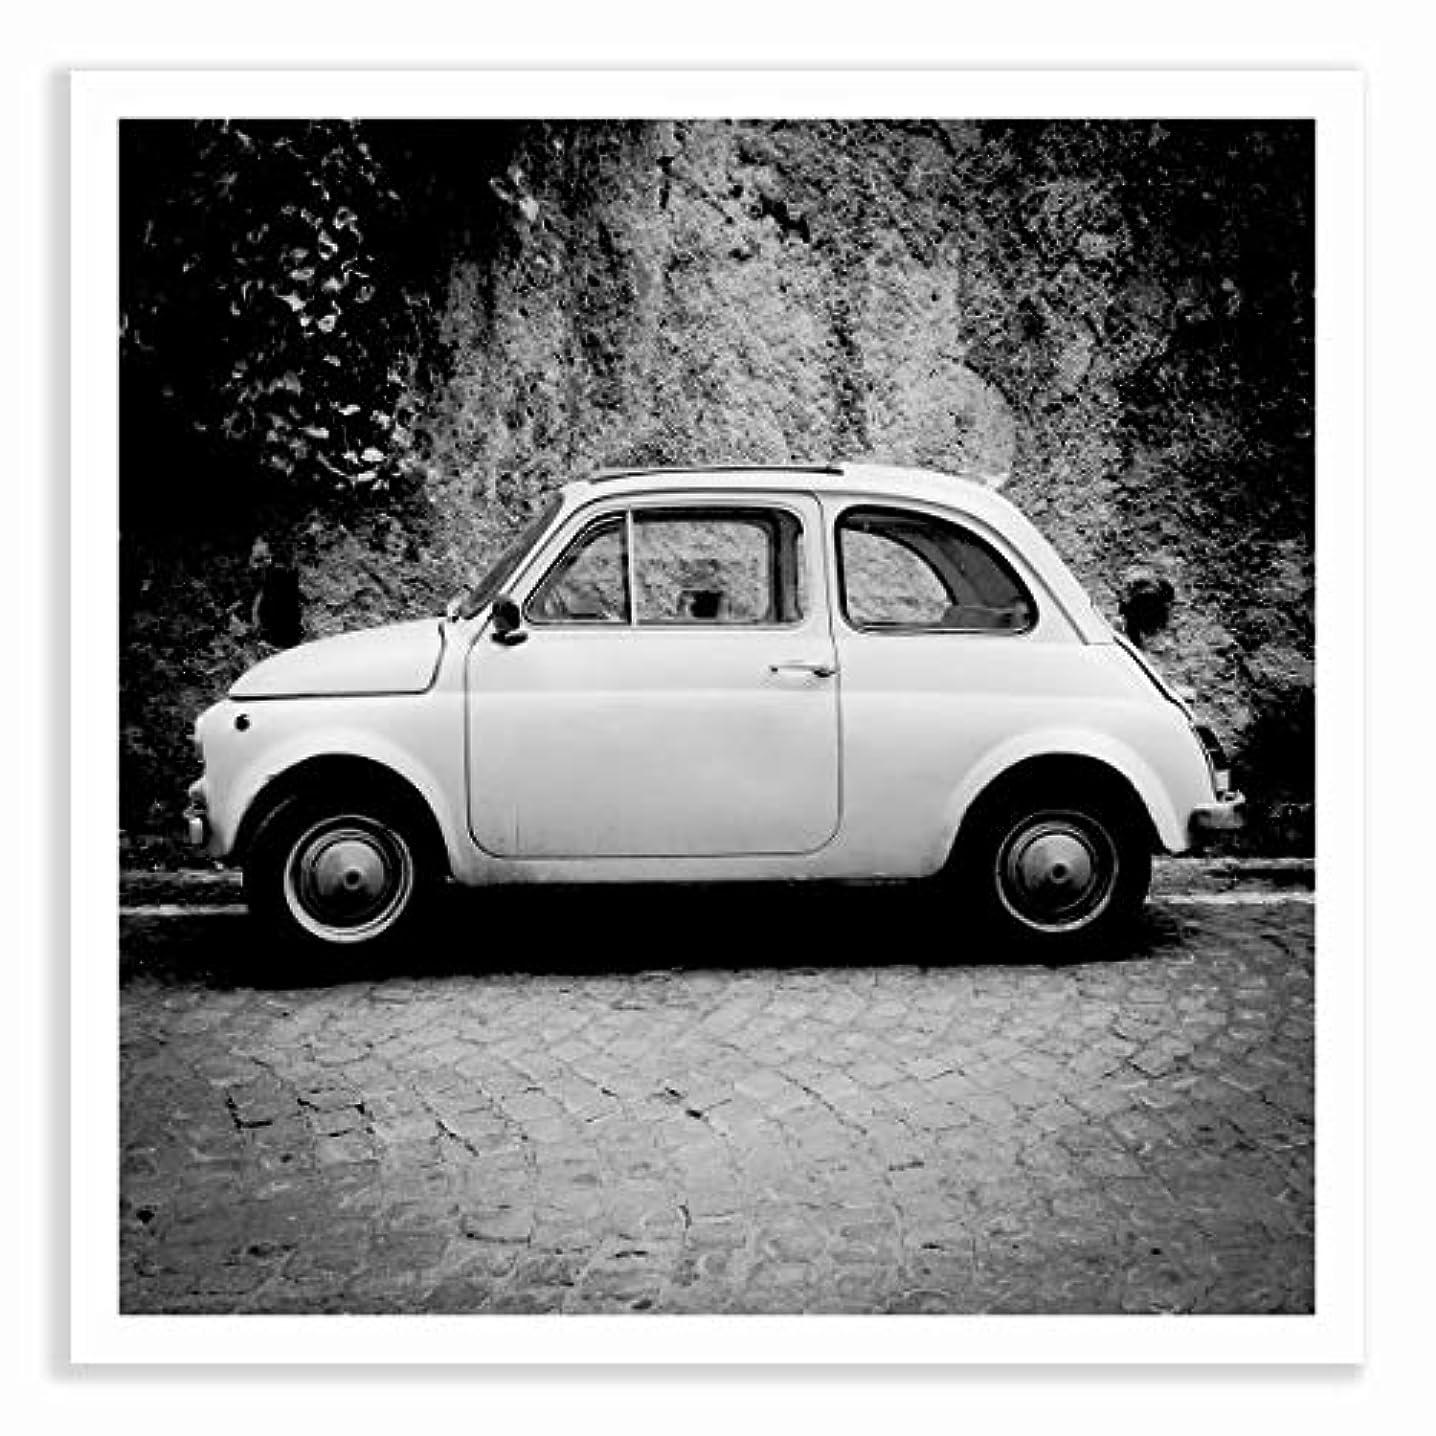 Fiat 500 Black and White Satin Black Aluminium Frame with Mount, Multicolored, 60x60